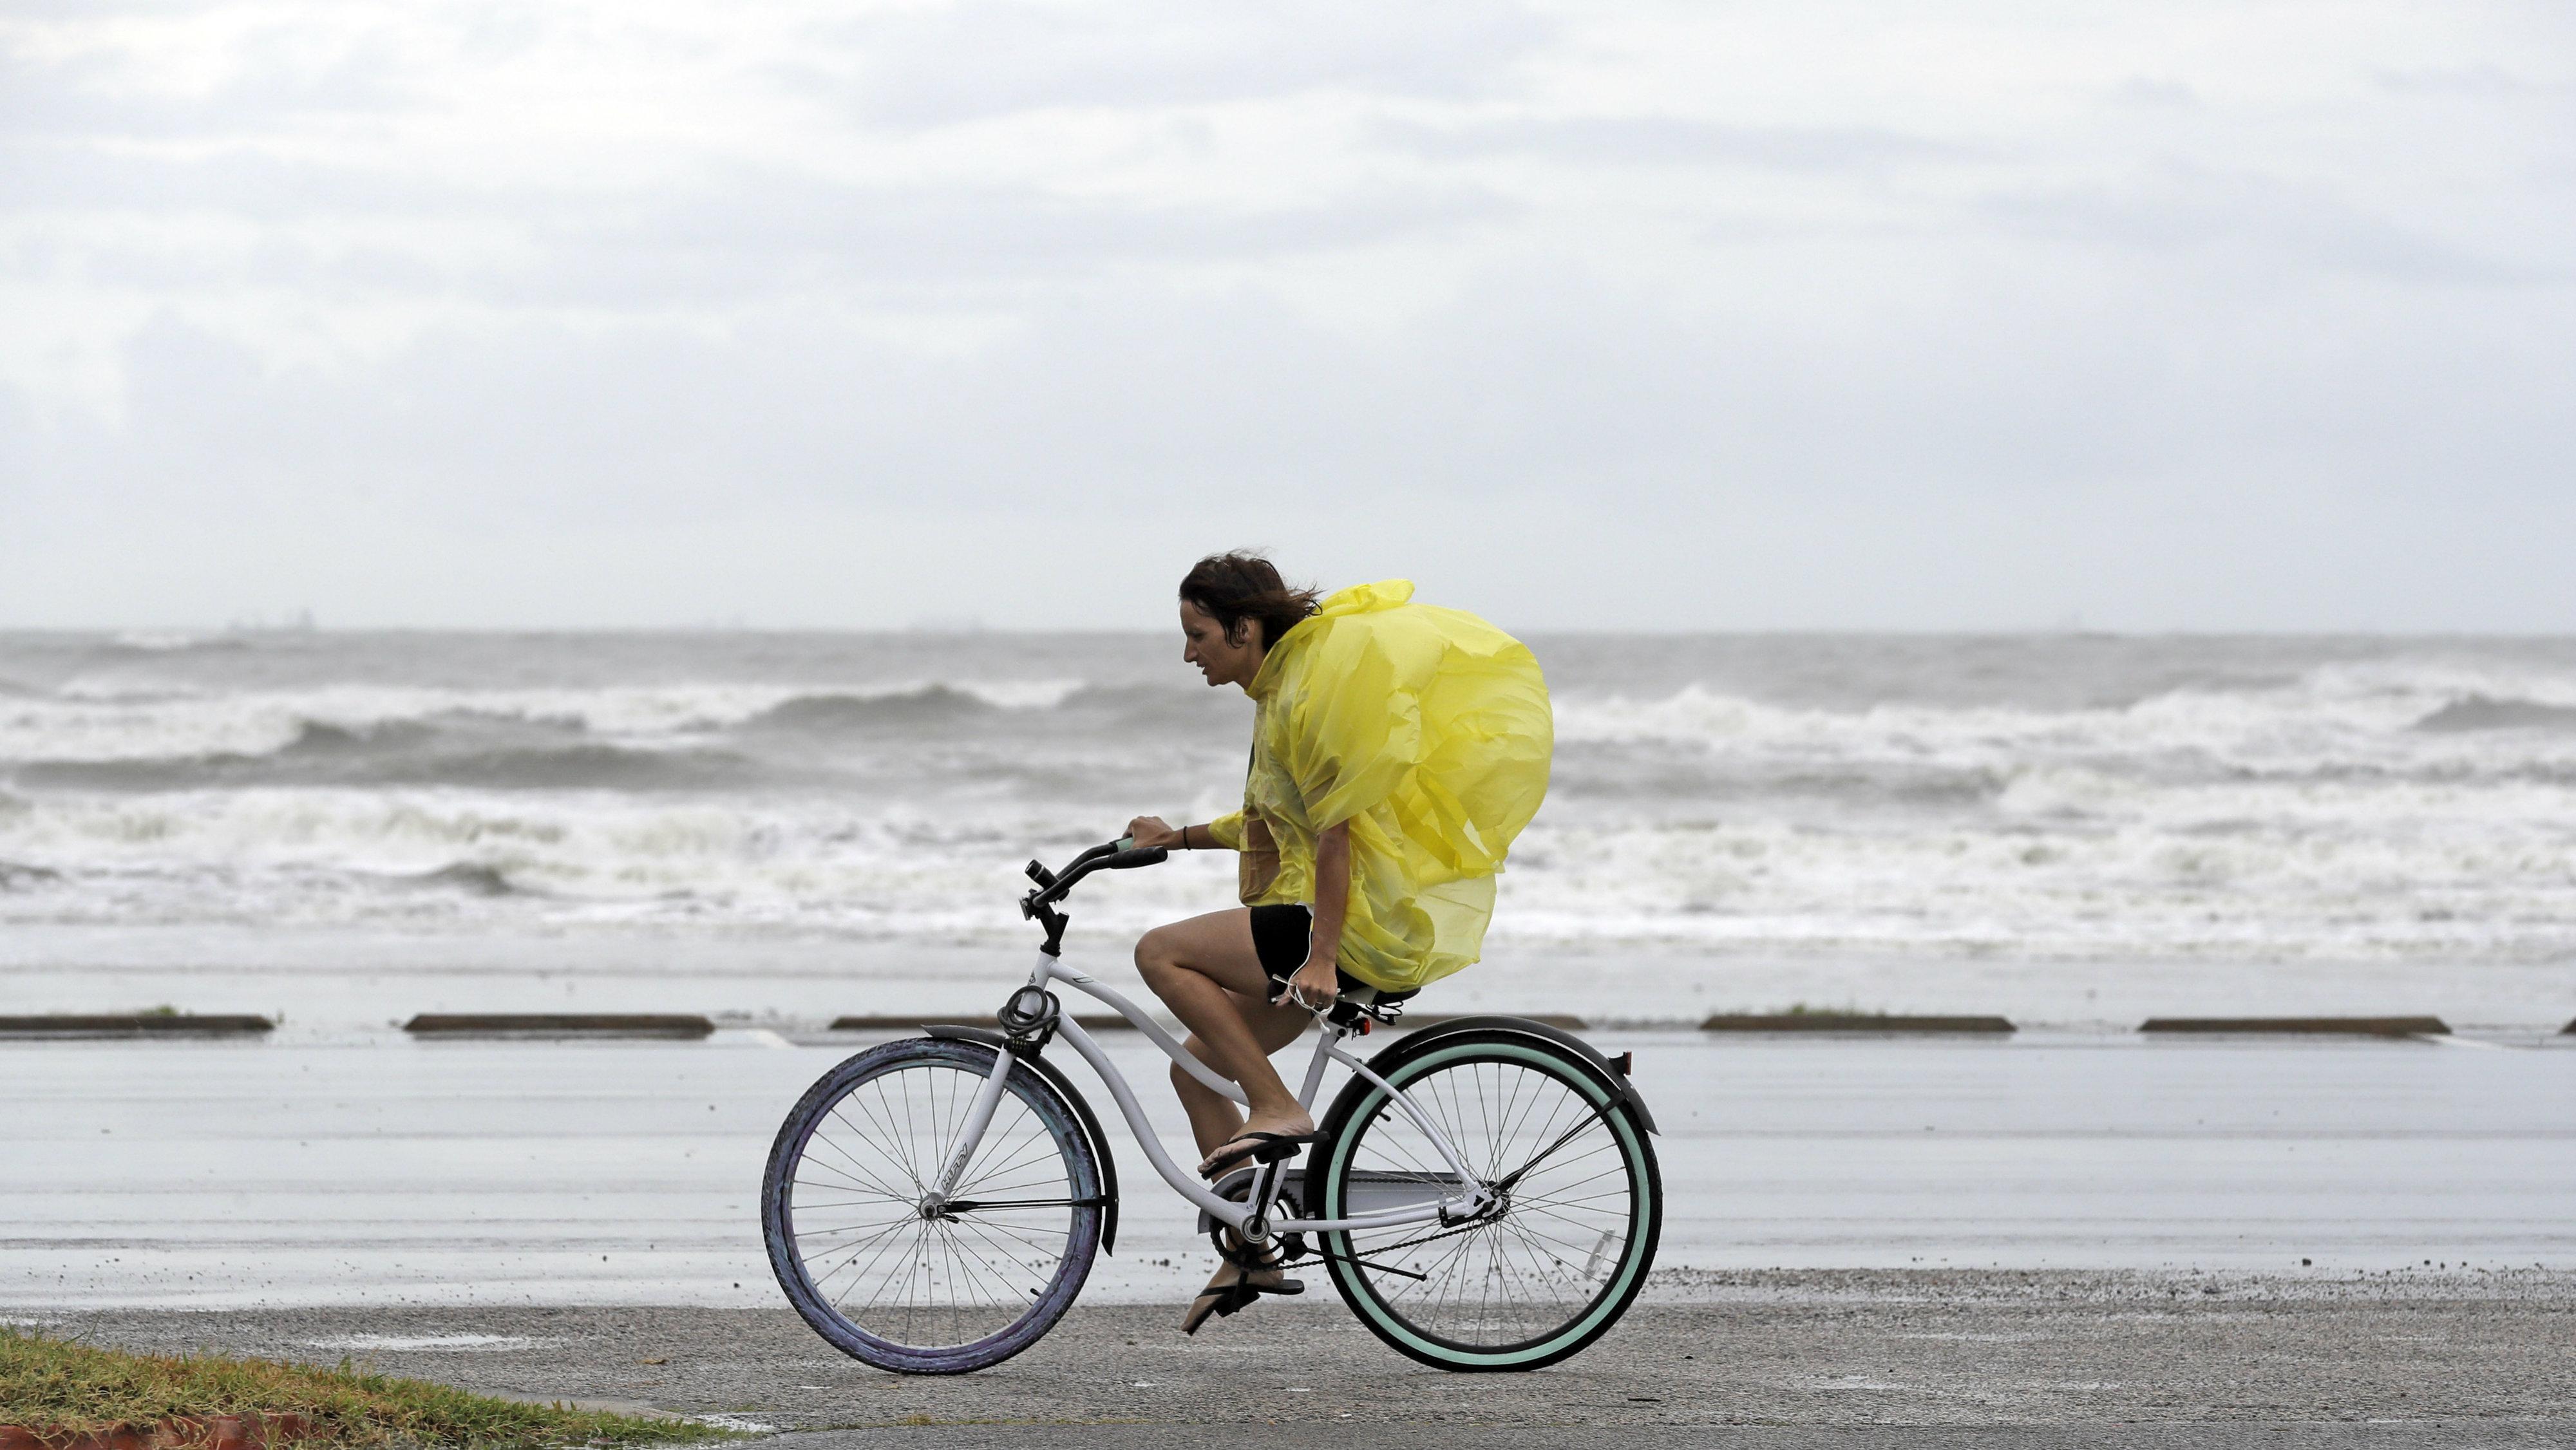 Residents on the Texas coast are bracing for Hurricane Harvey make landfall.